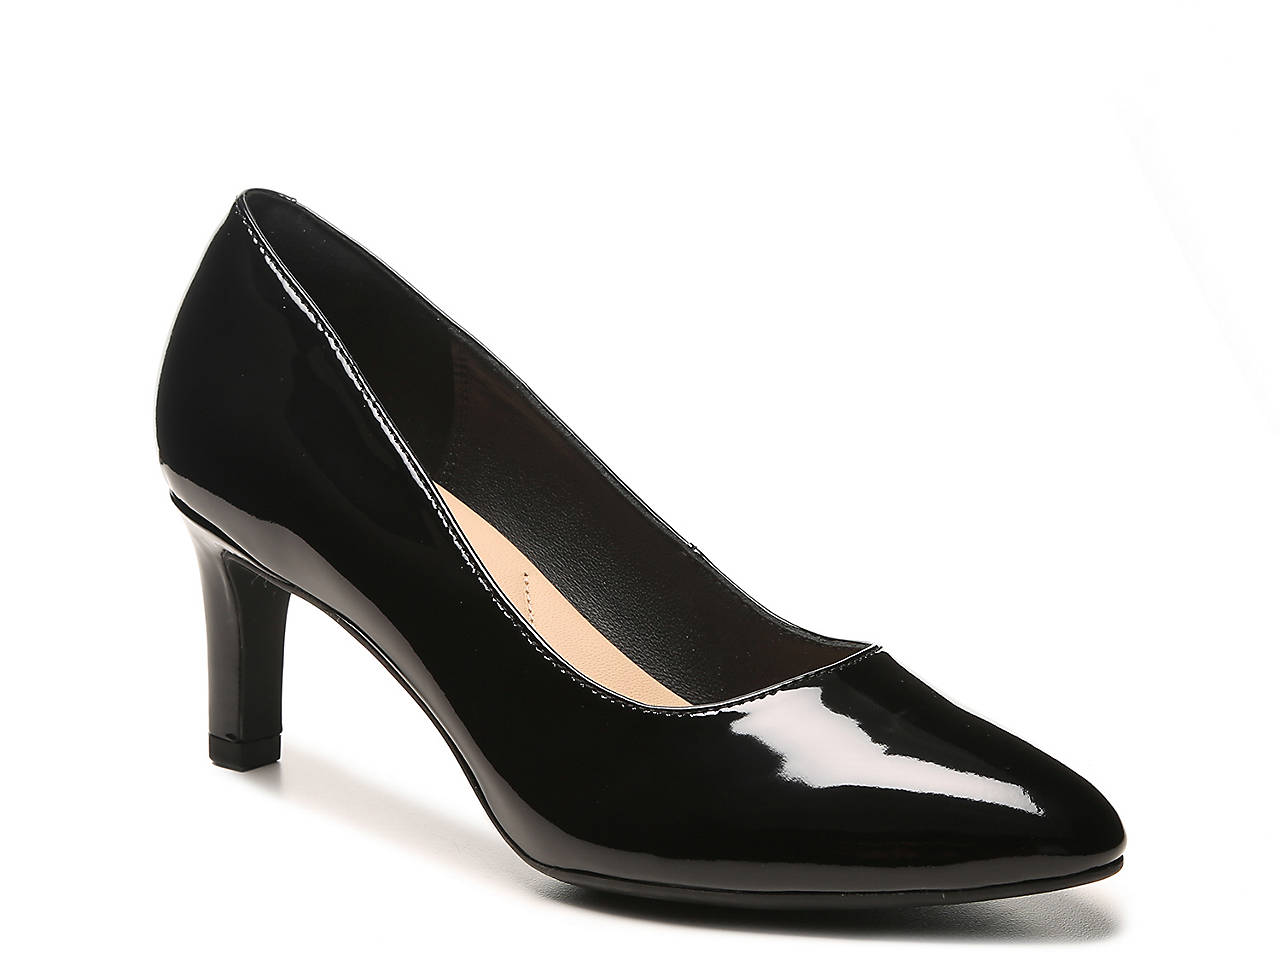 8605a80684ef Clarks Calla Rose Pump Women s Shoes